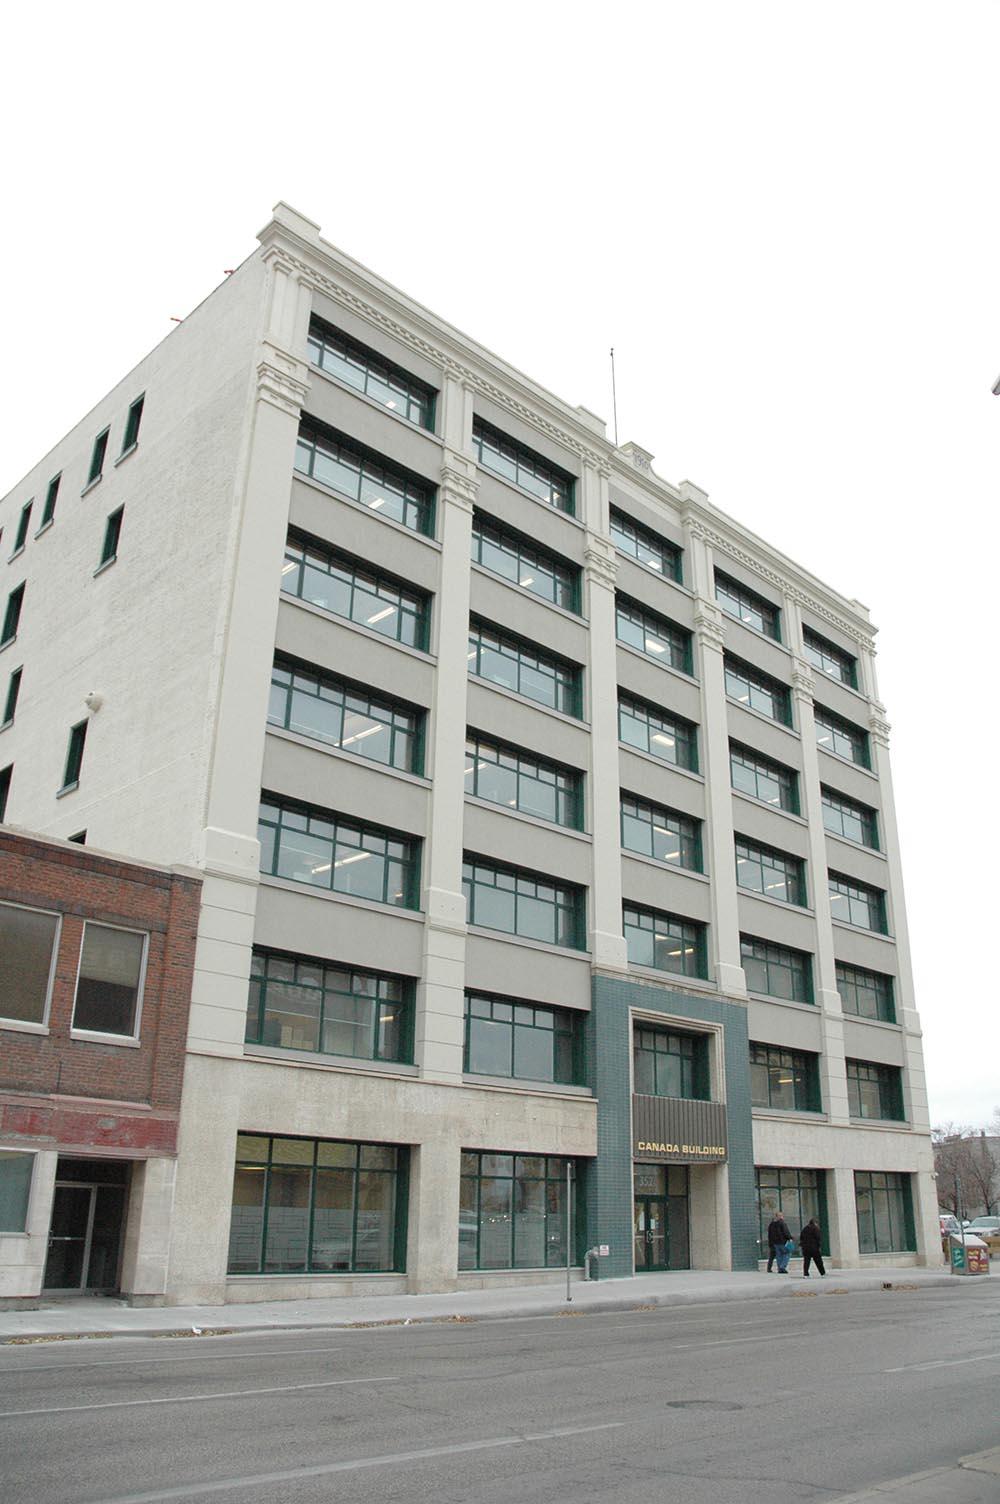 Canada Building Interior Re-development